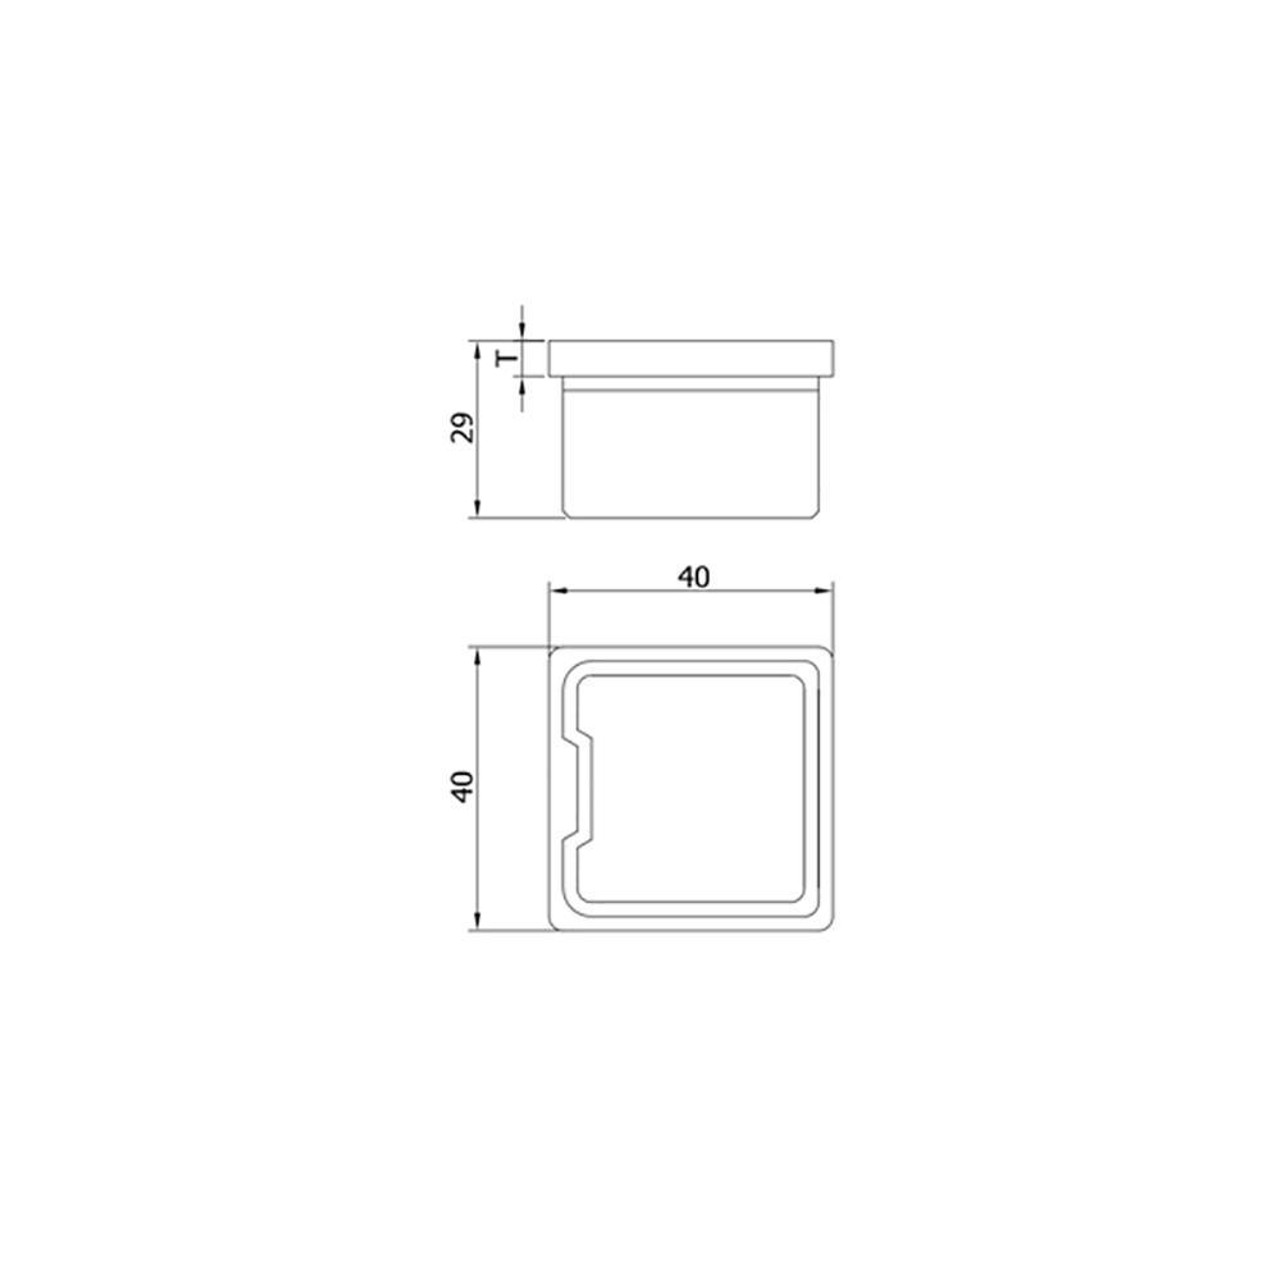 Flat End Cap for Square Rail – 40 x 40 x 2 mm (AX20.007.130.A.SP) CADD